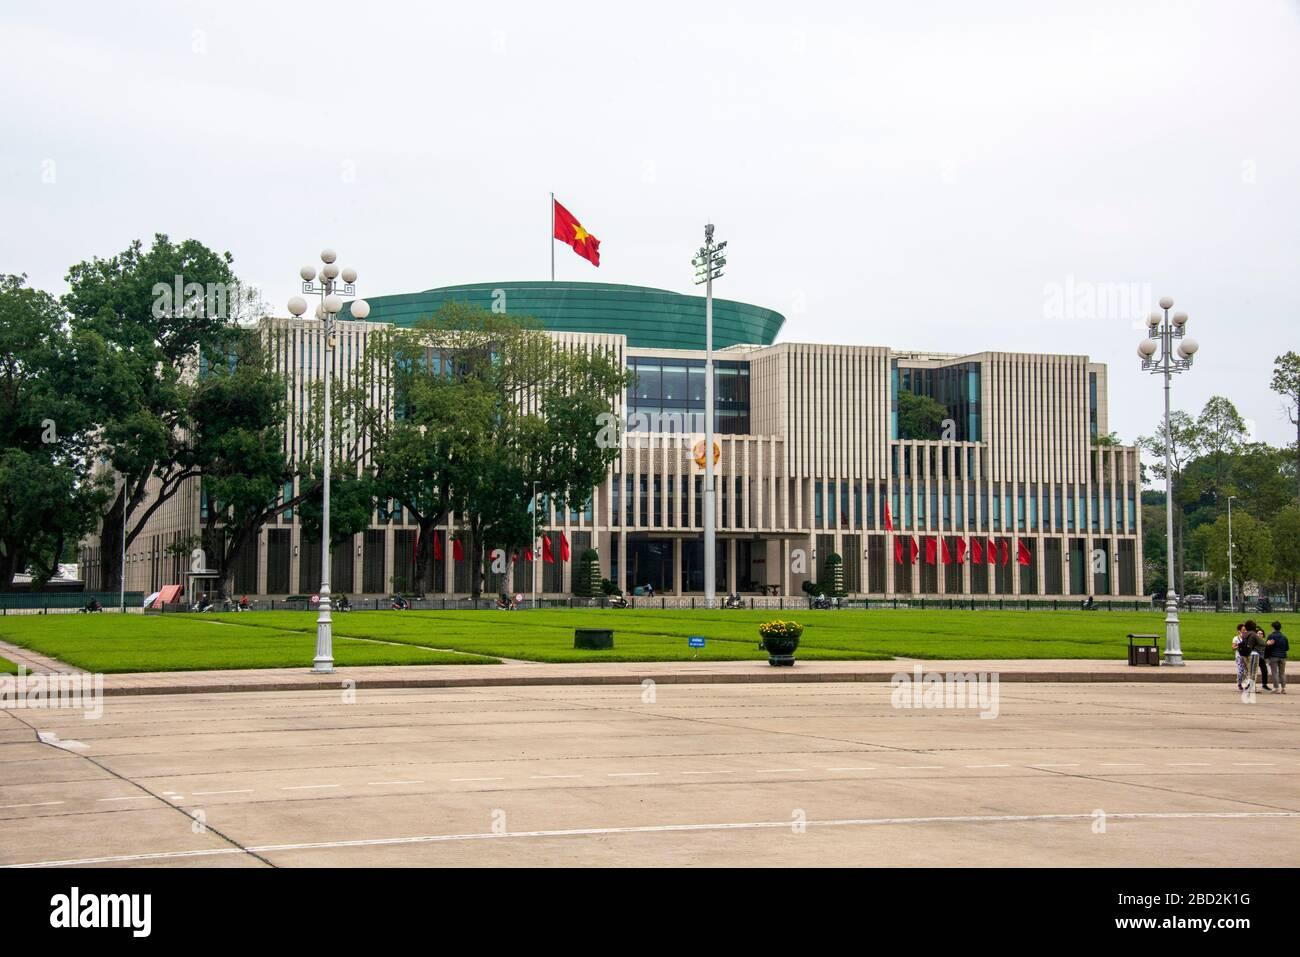 The National Assembly Building, Ba Dinh Square, Hanoi, Vietnam. Stock Photo